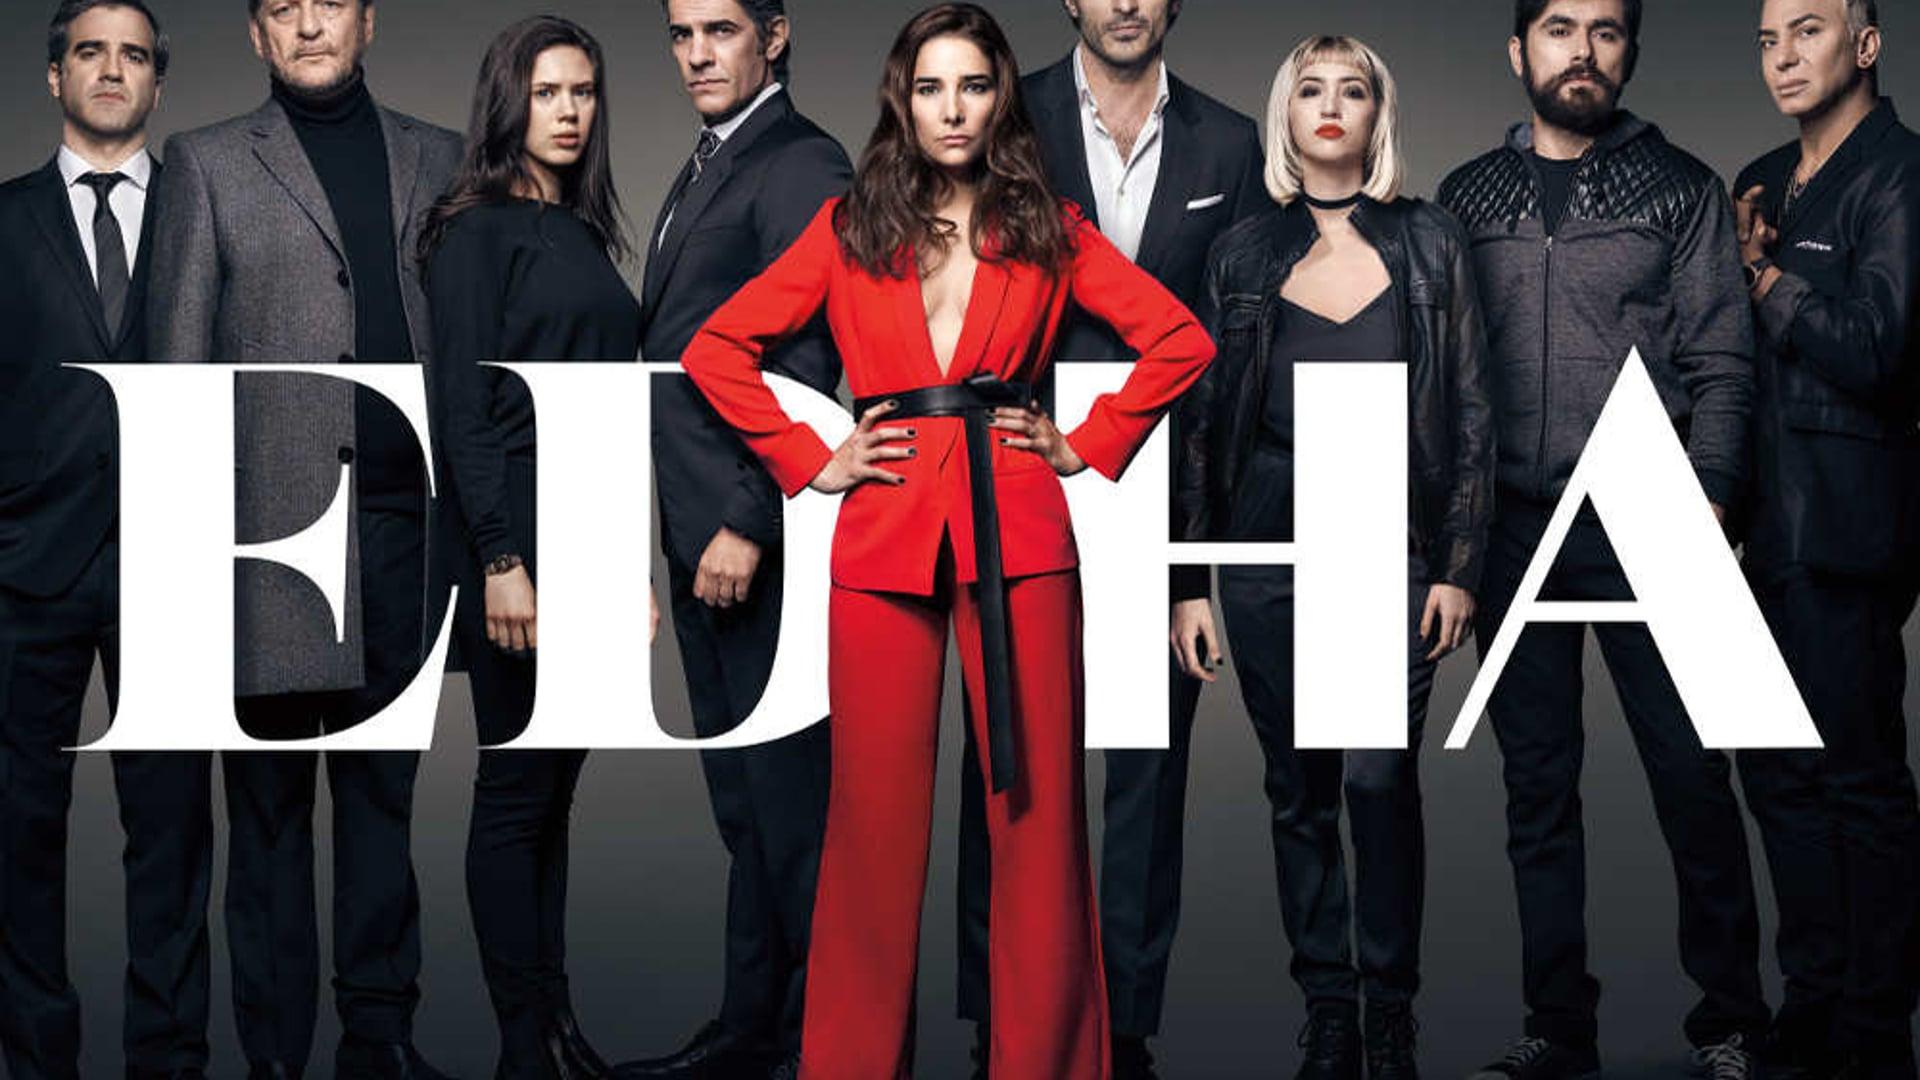 Edha - Netflix TV serie